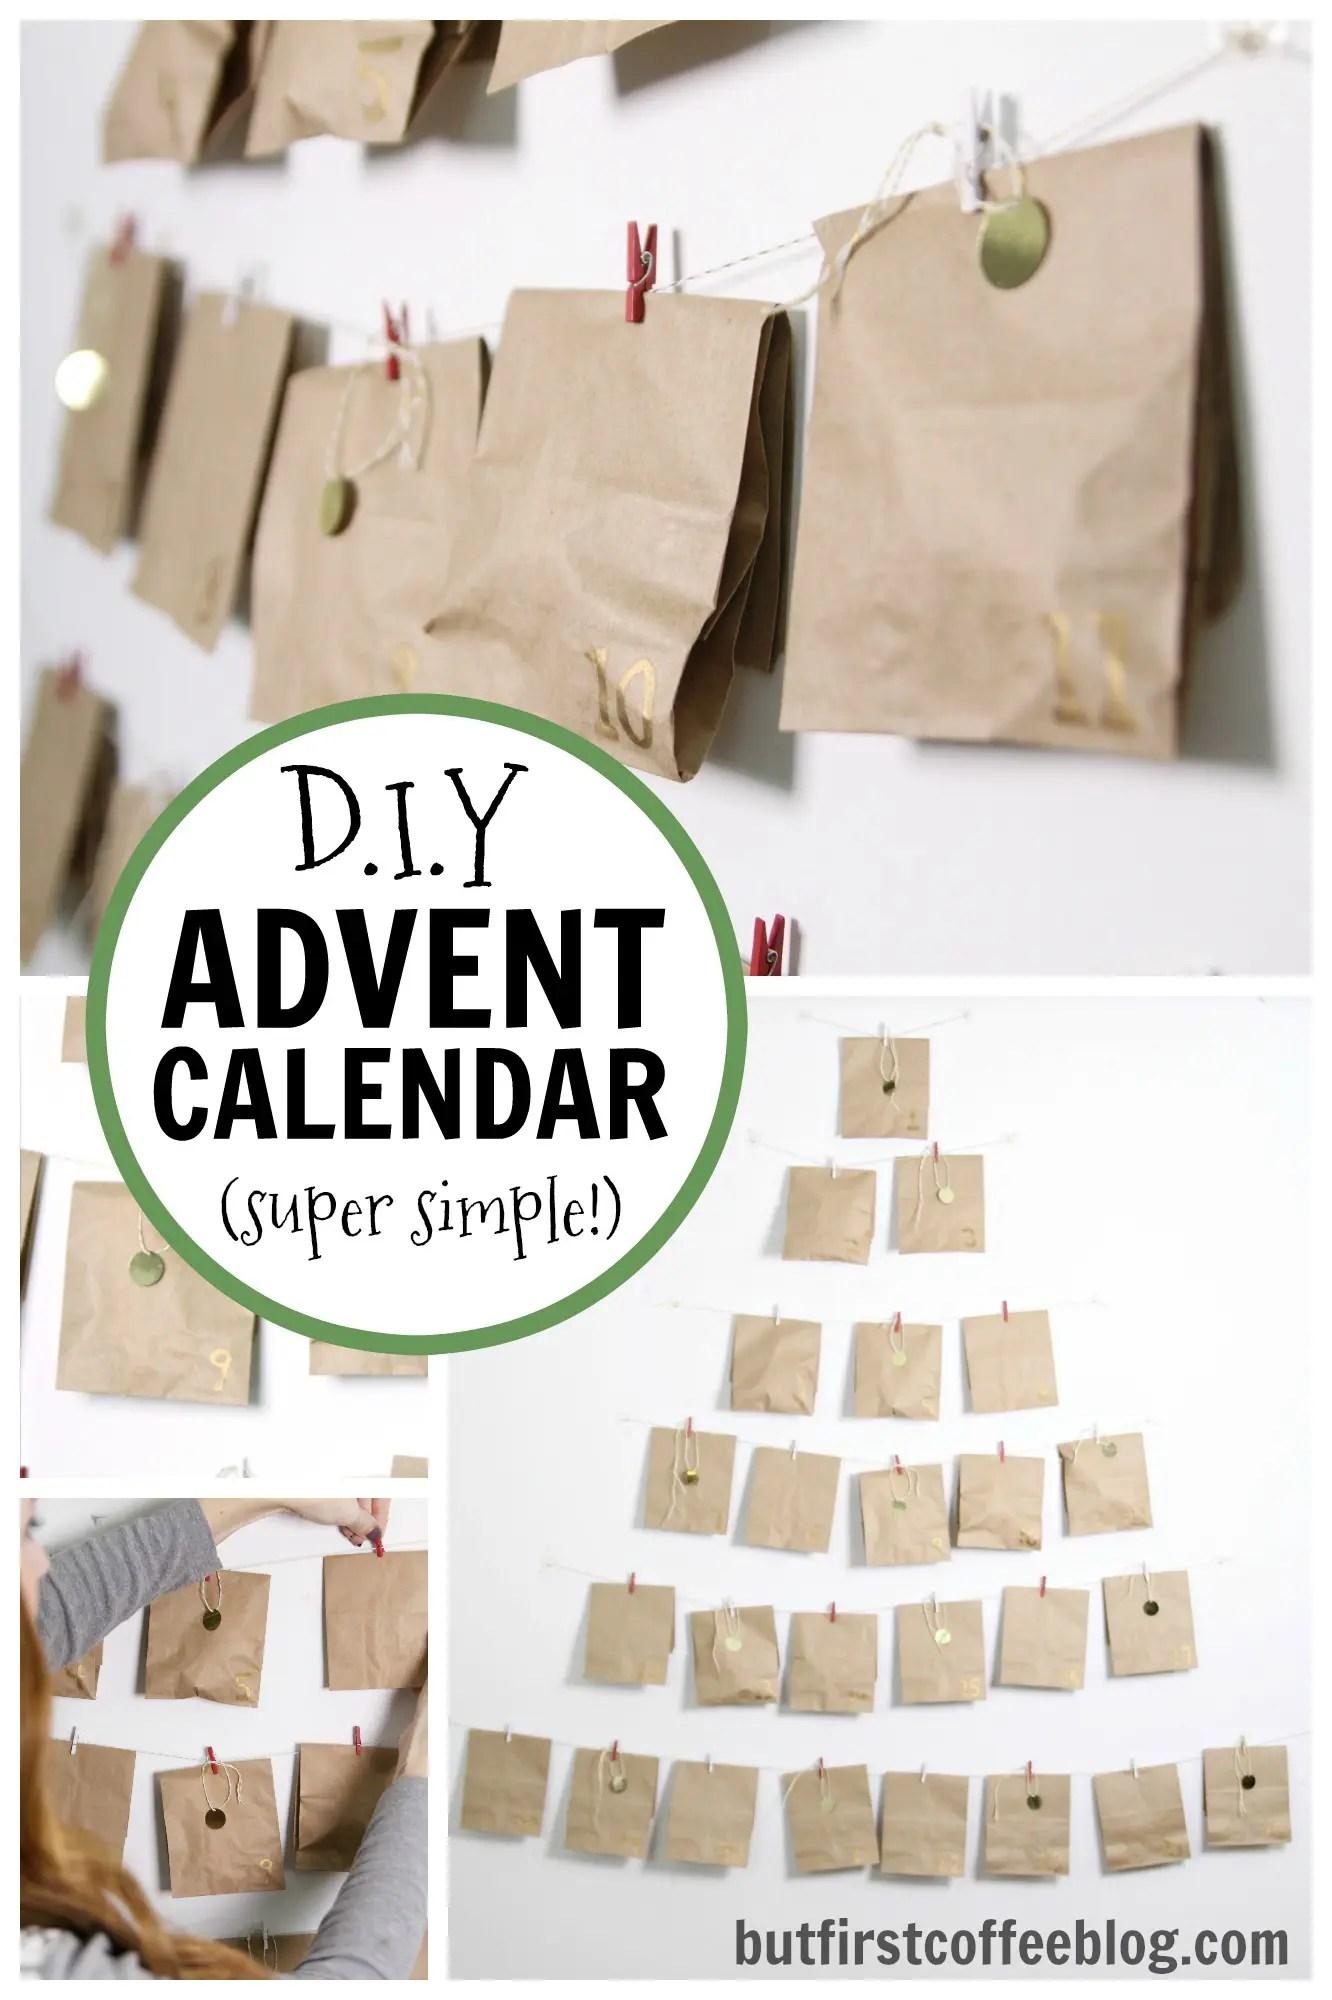 Calendar Design Diy : Do yourself diy work tools calendar stock vector royalty free